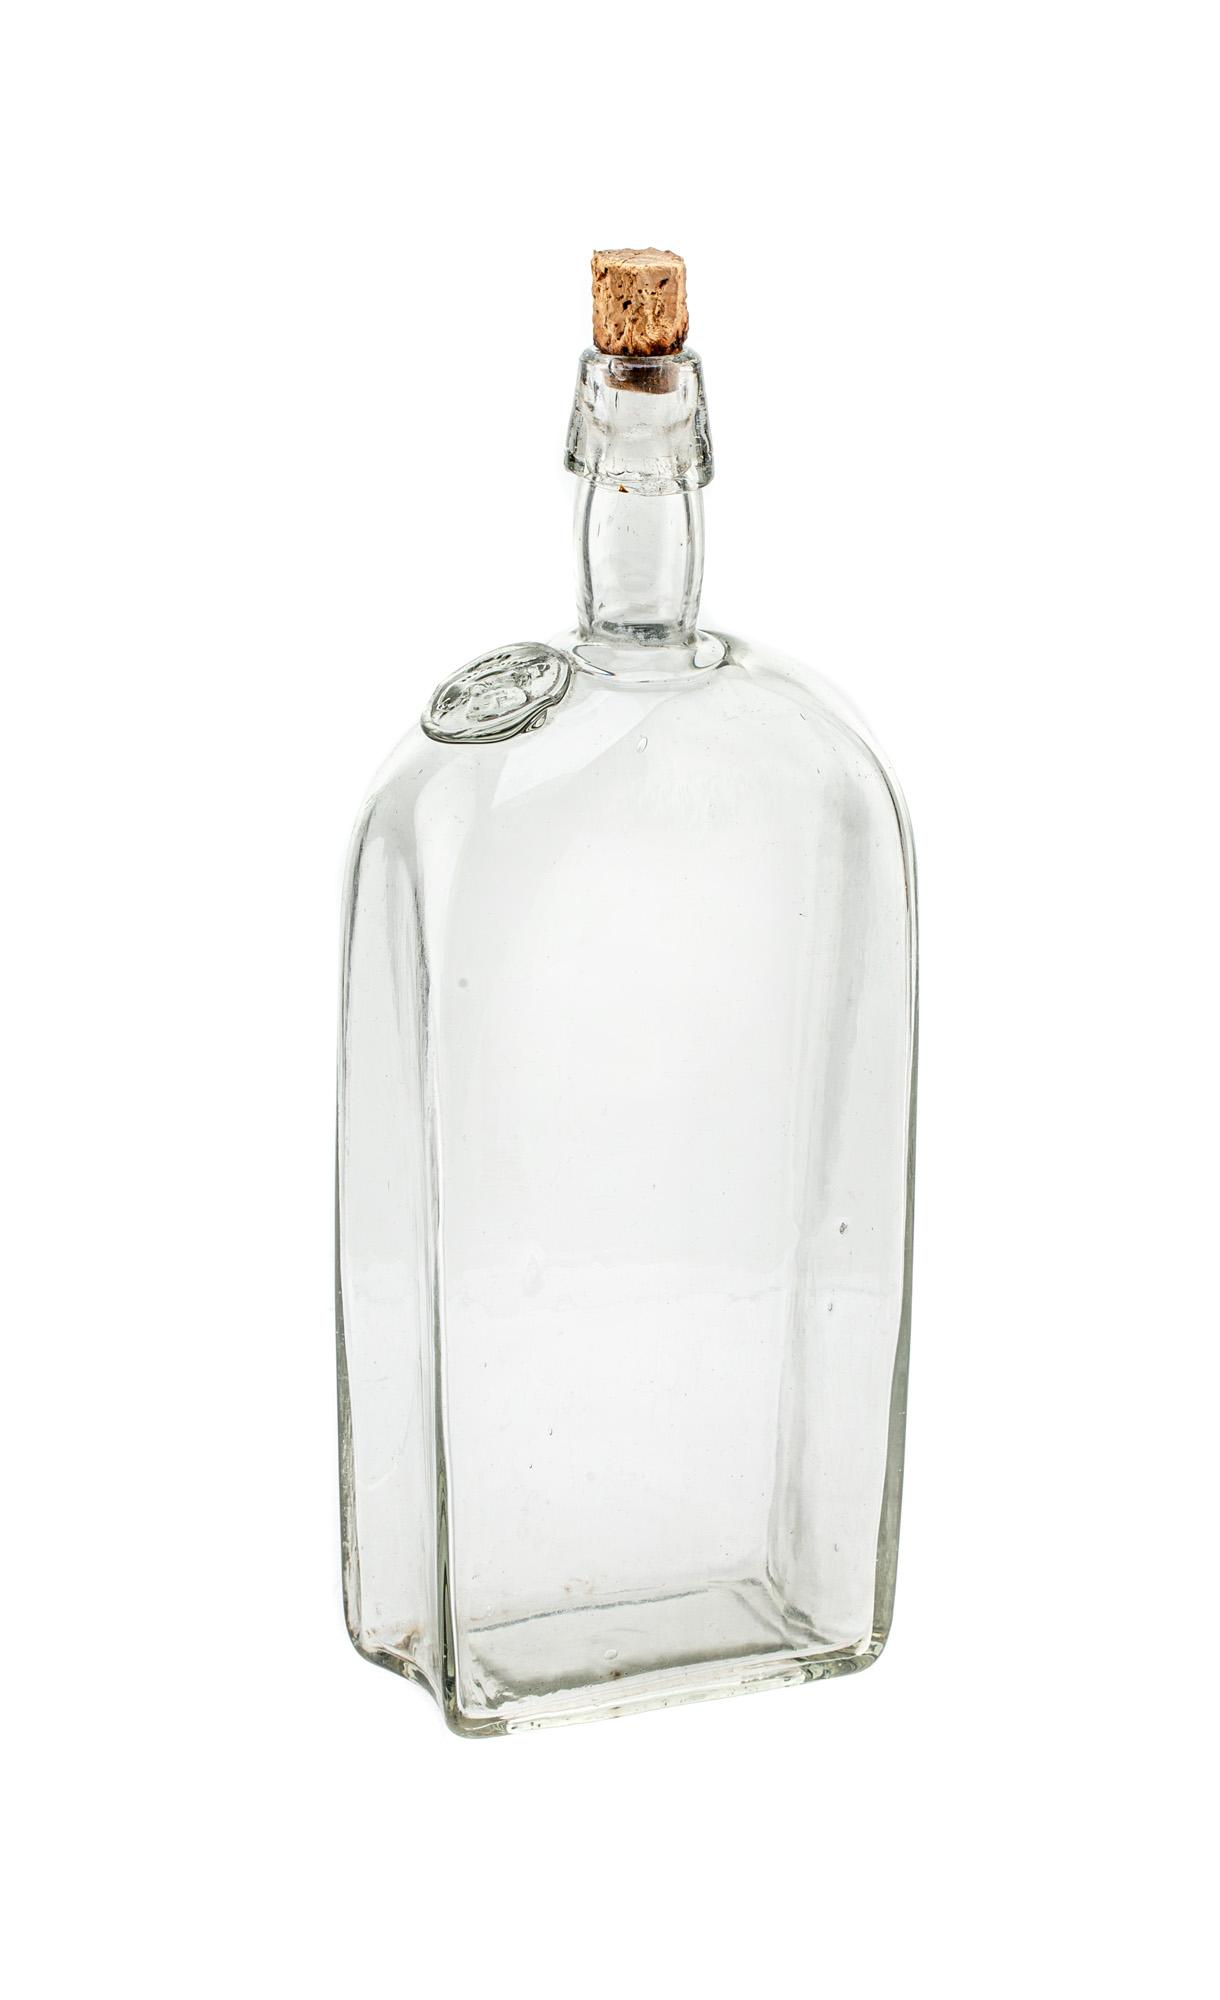 Butelka z herbem 'Pilawa', XIX/XX w.